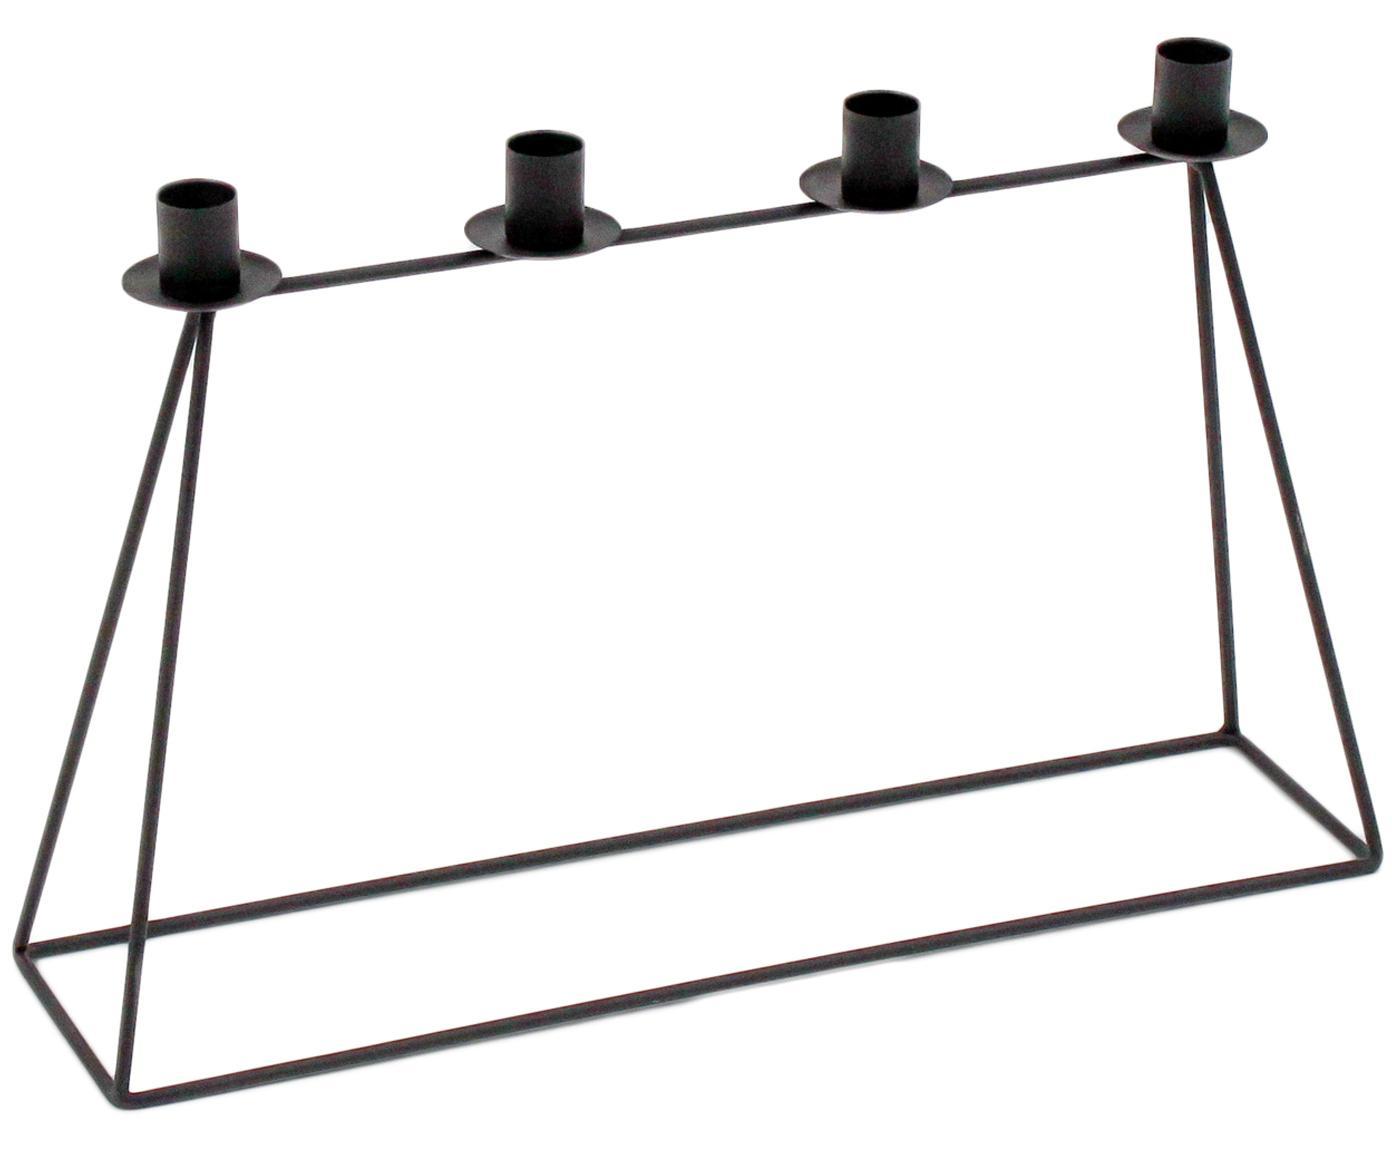 Kerzenhalter Copenhagen, Metall, lackiert, Schwarz, 45 x 29 cm